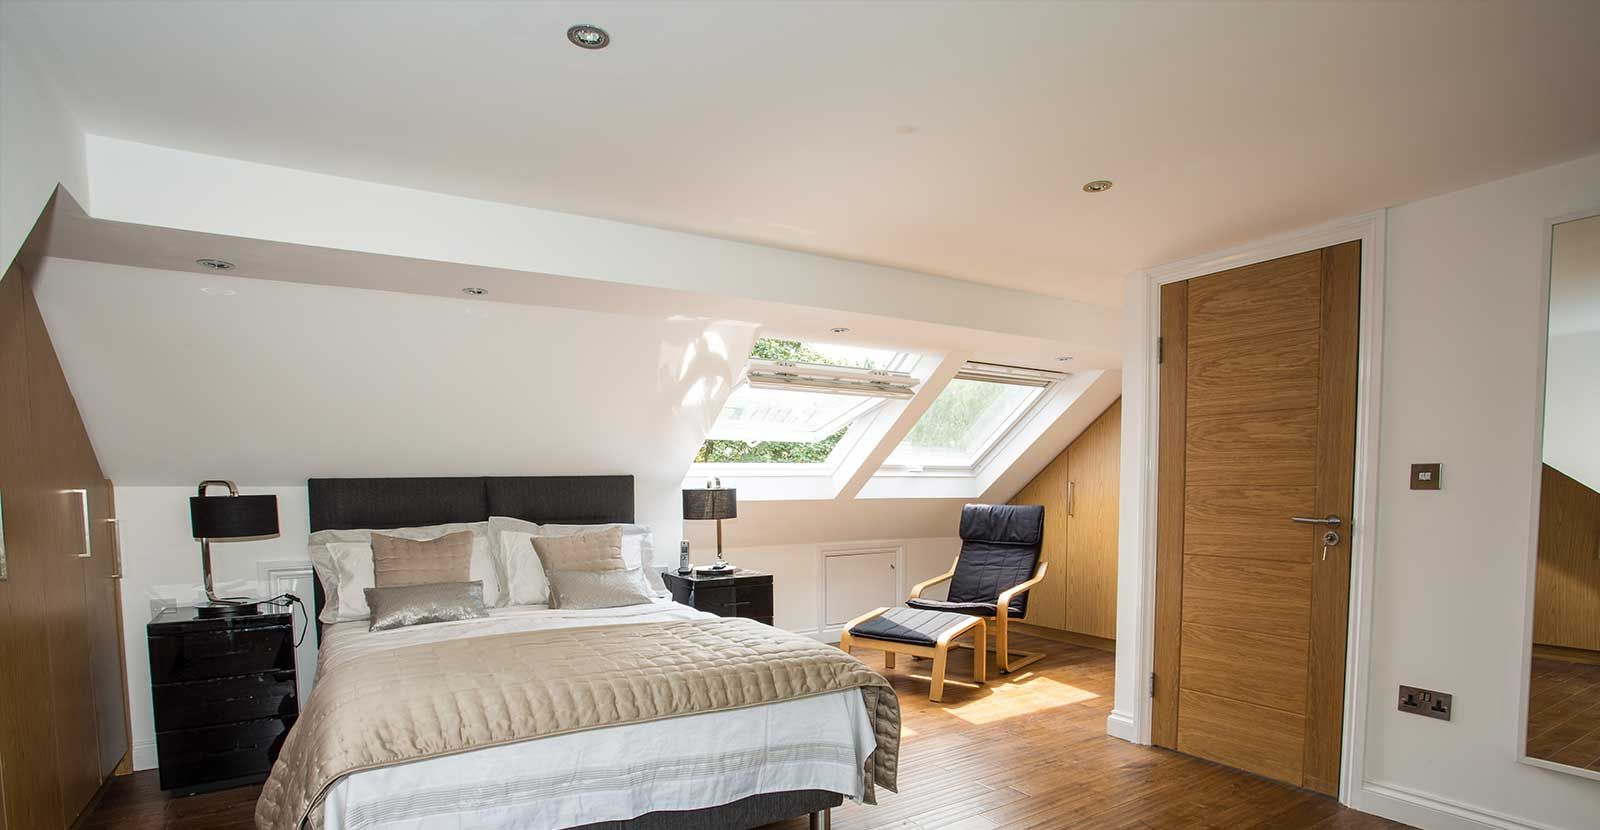 Loft Conversion Room Design